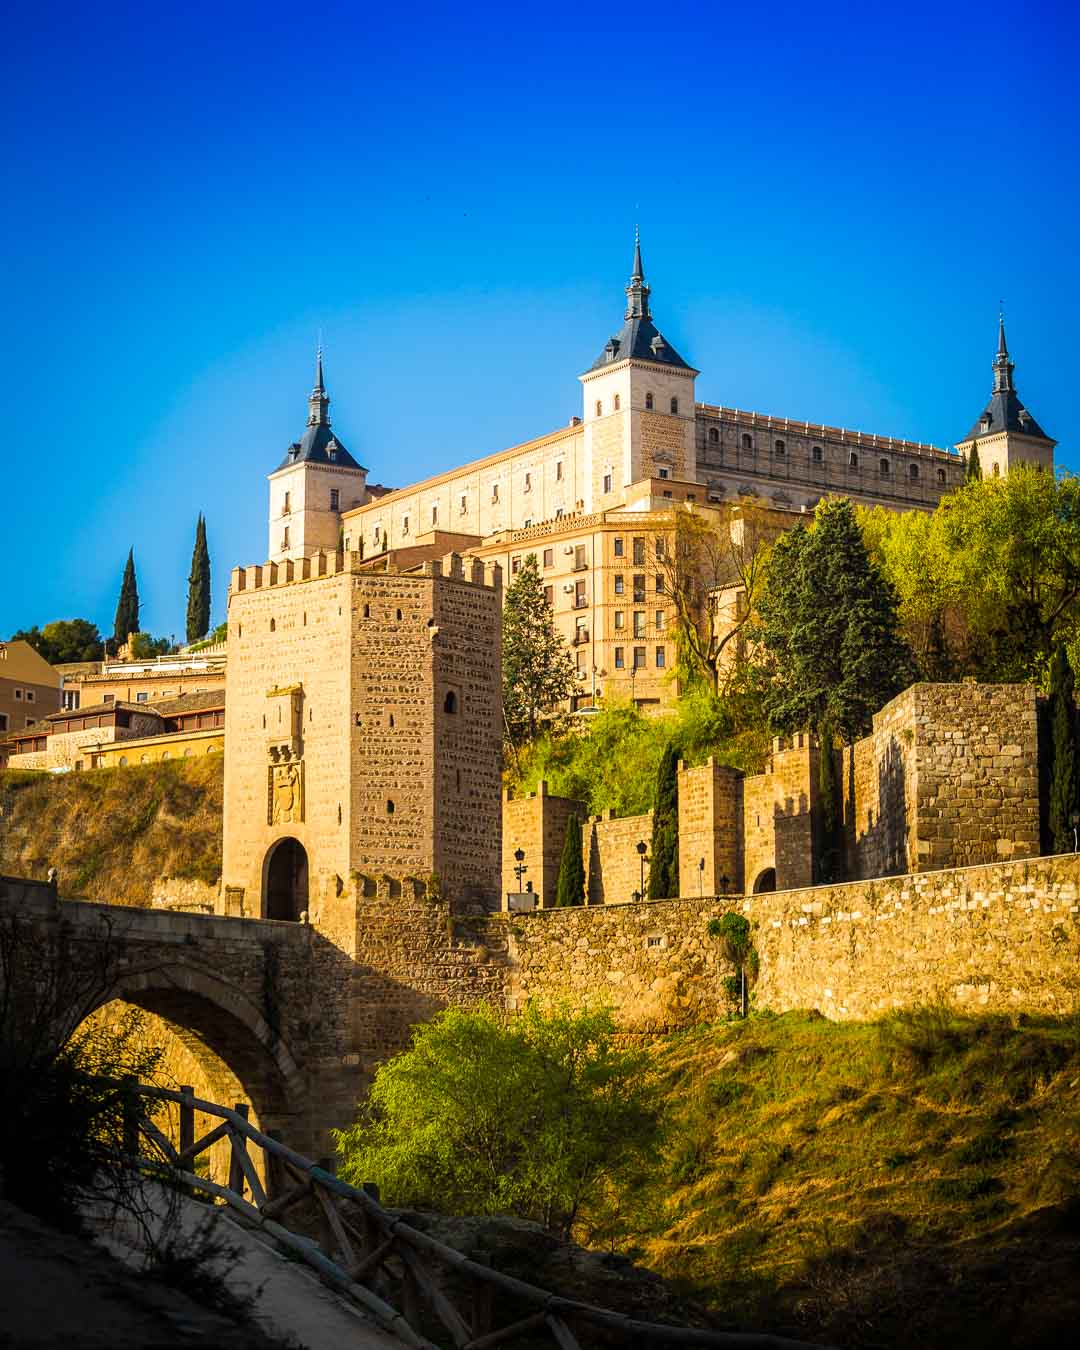 Puente de Alcantara, Toledo - Discovering the Roman Bridge